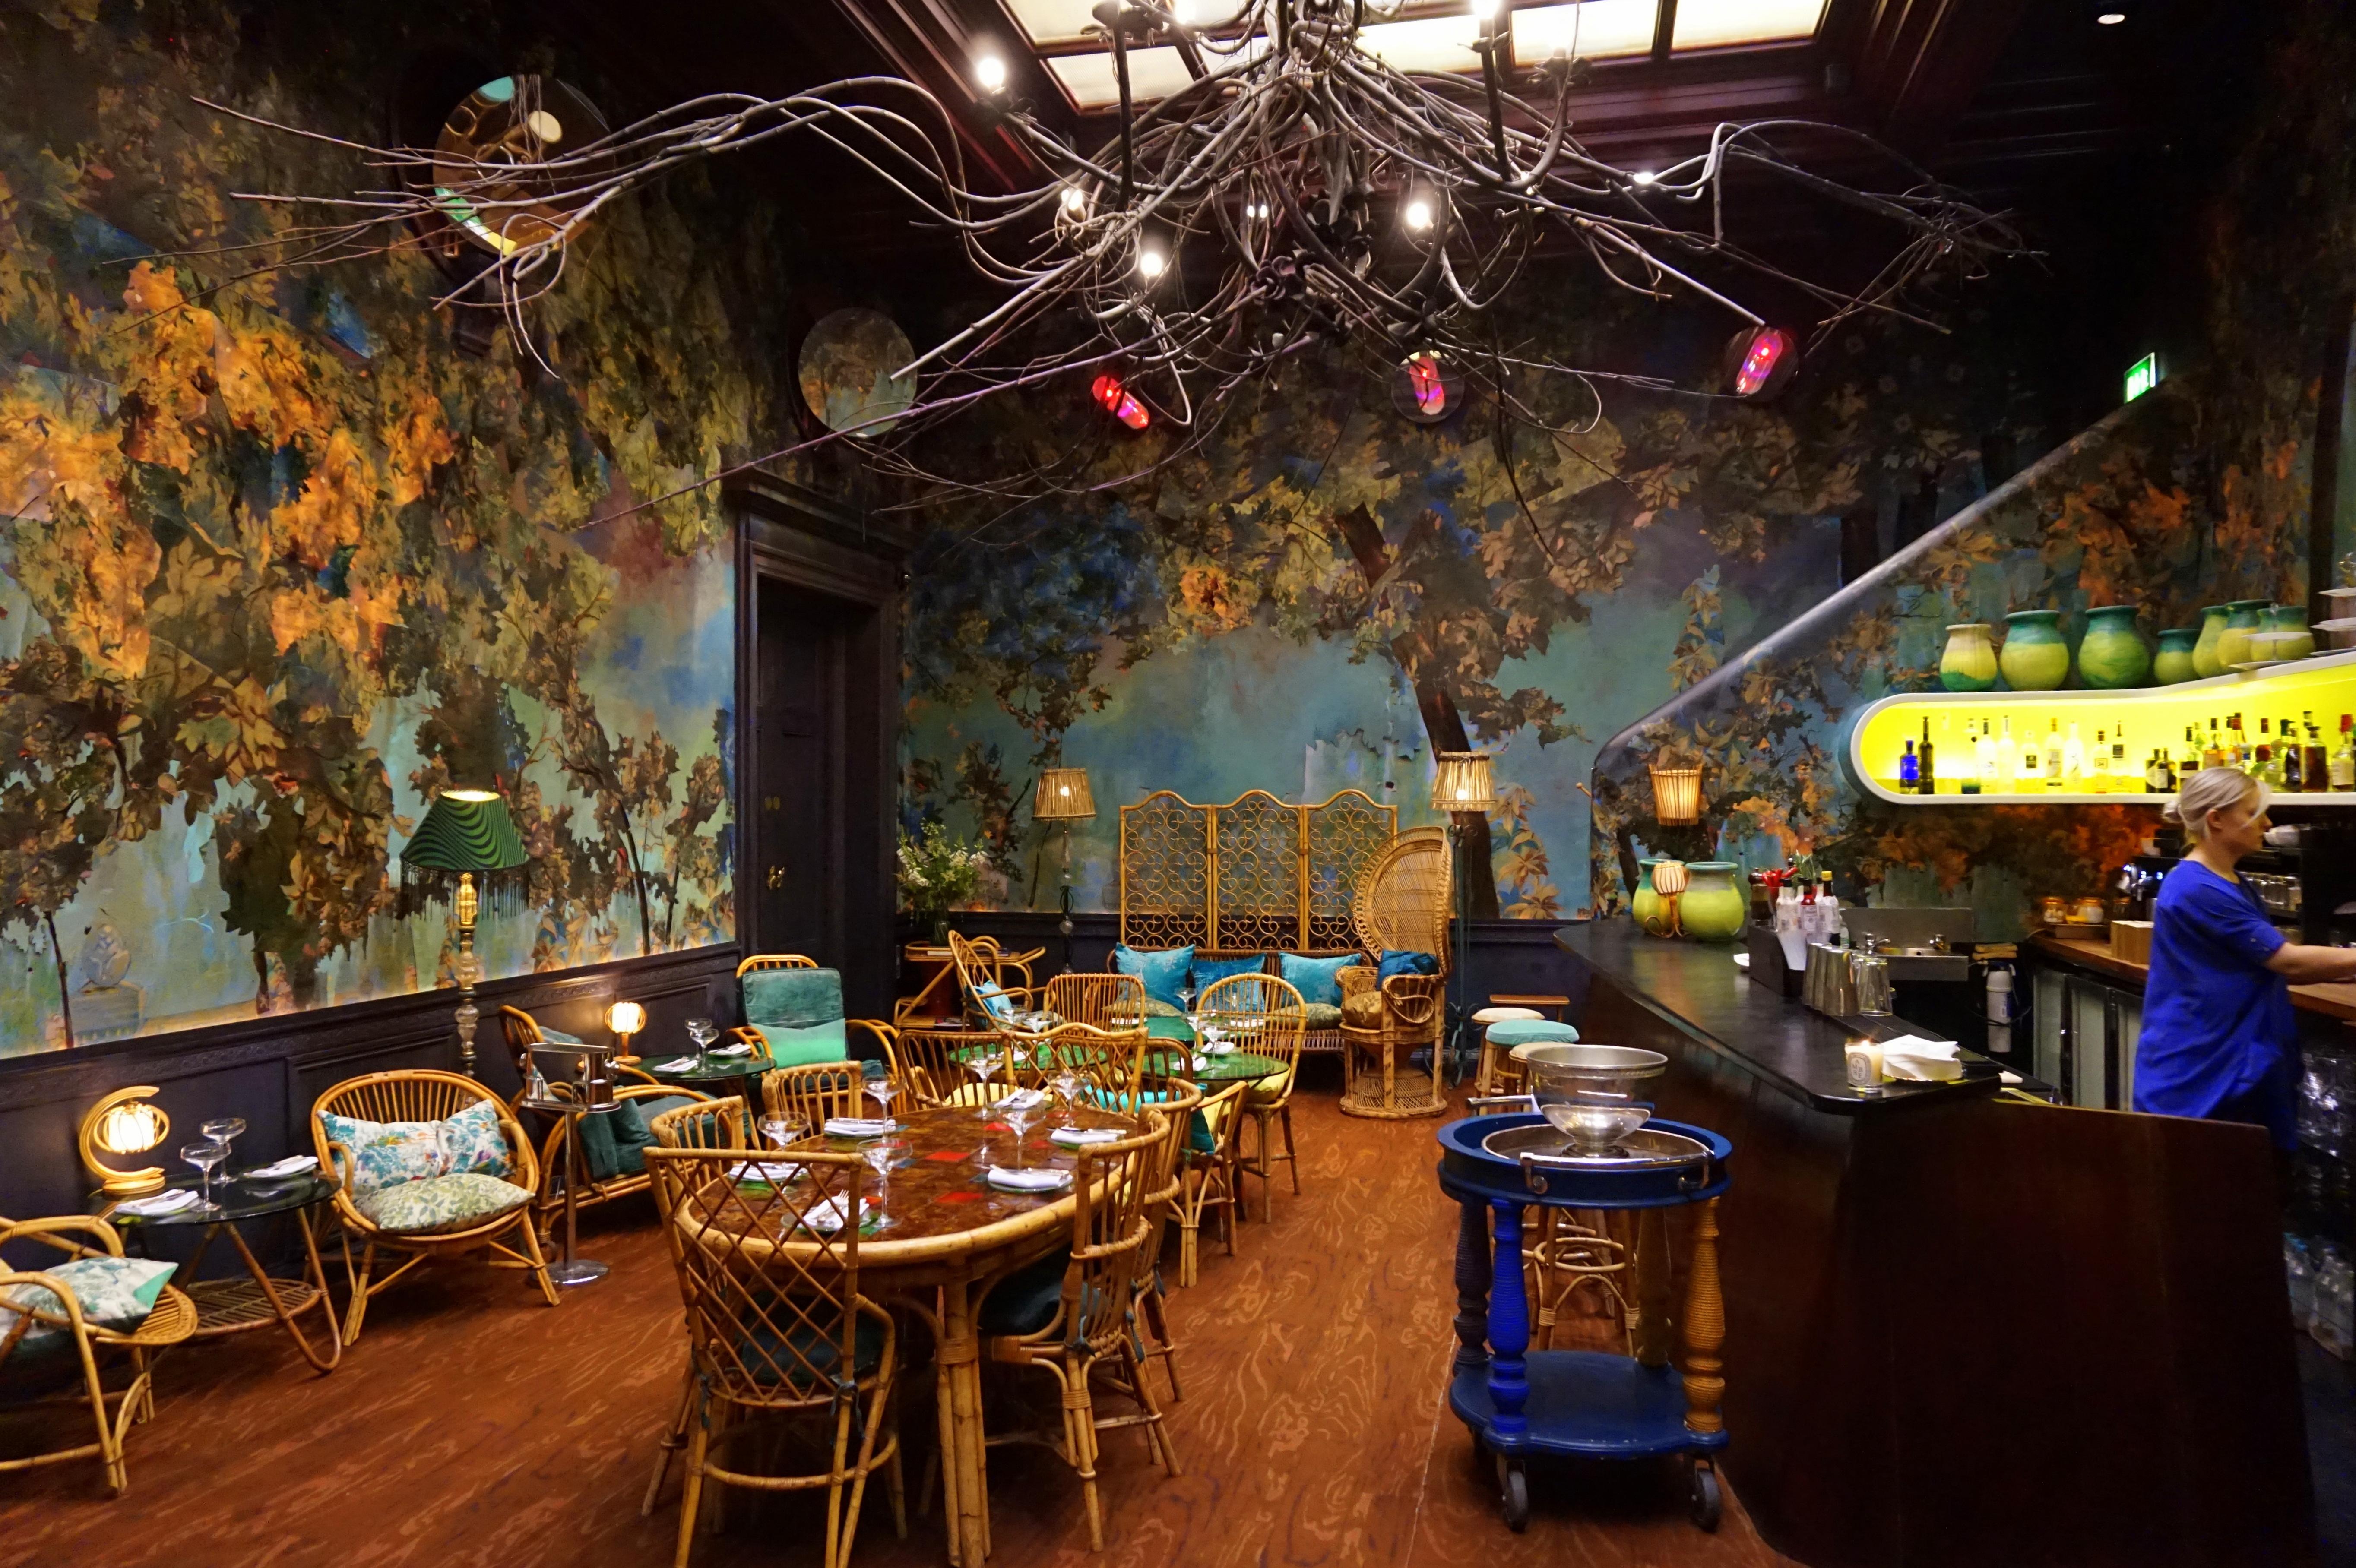 london cool places unusual eat egg restaurant annaeverywhere